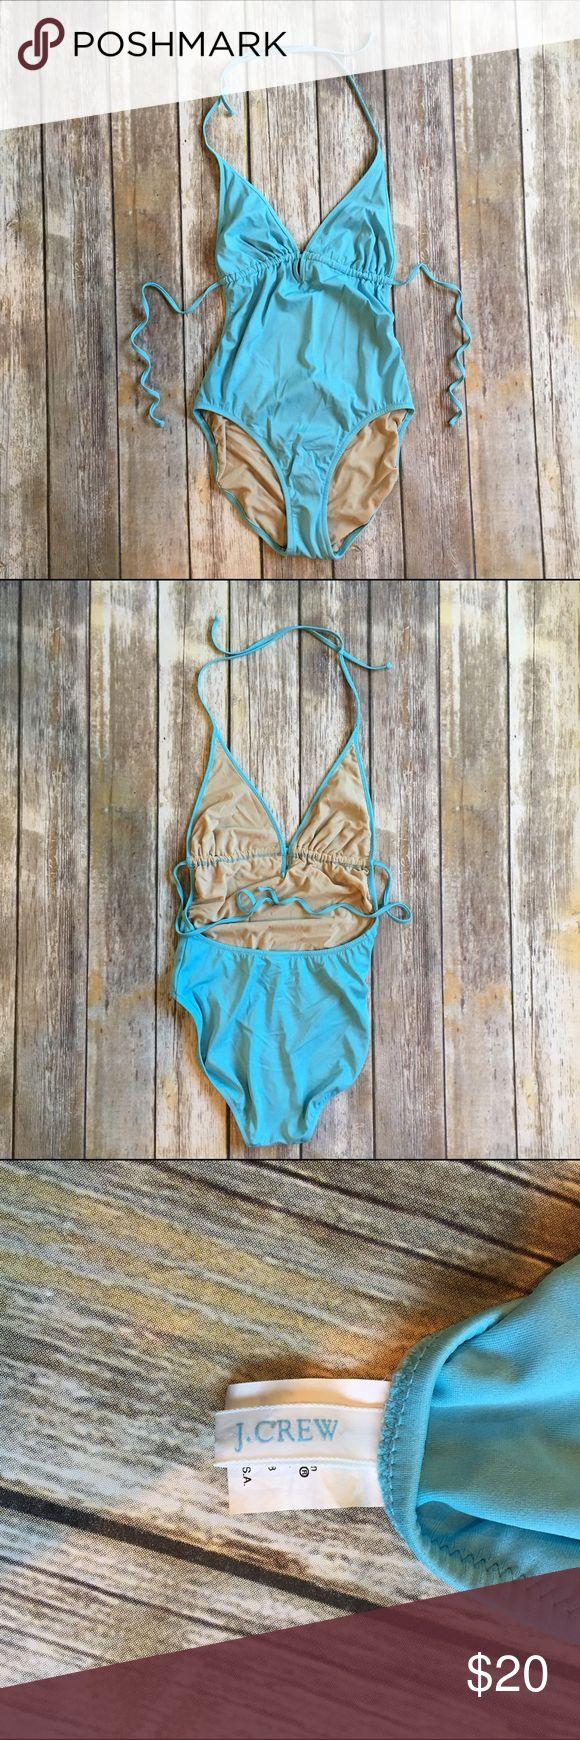 "J Crew blue 14 halter swimsuit J Crew blue 14 halter swimsuit. In great condition. Bust 13"", length 30"". 81% nylon 19% Lycra. J. Crew Swim One Pieces"